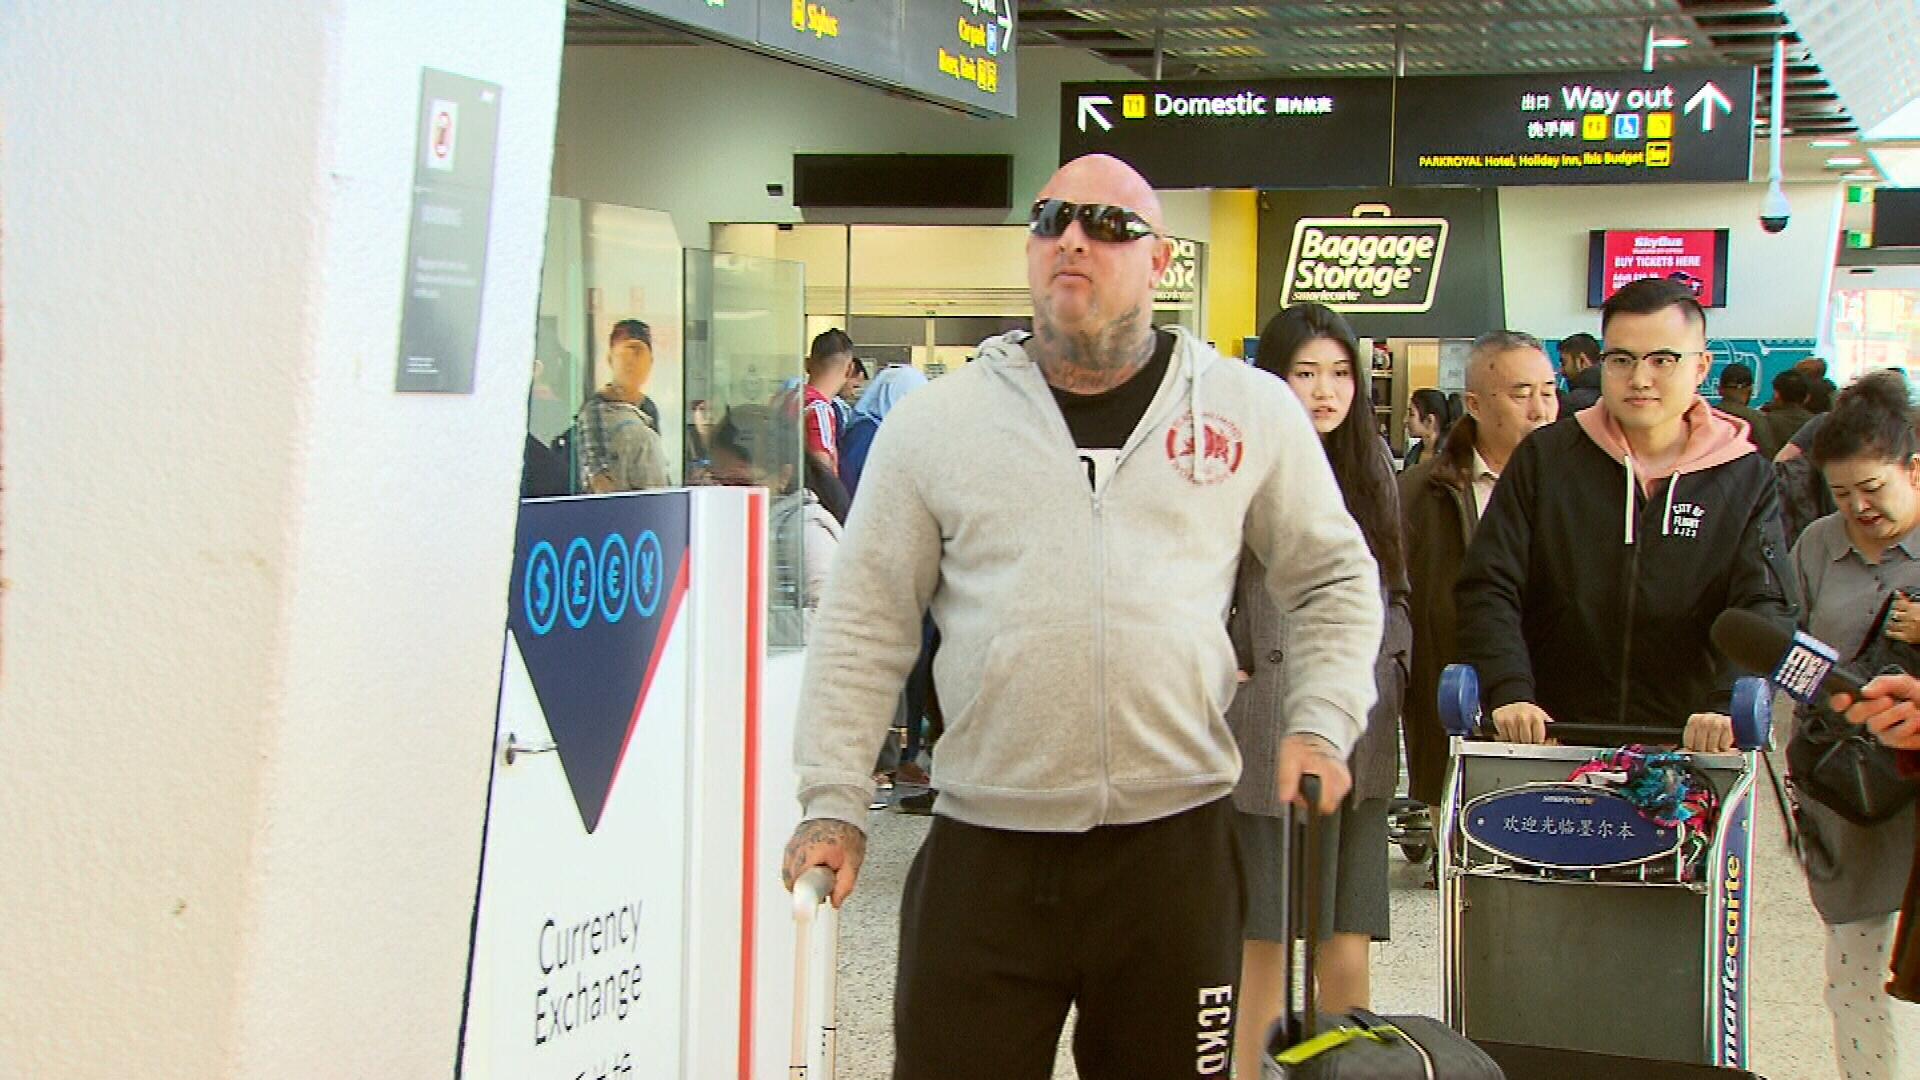 Bikie boss denied entry to Thailand after bail change